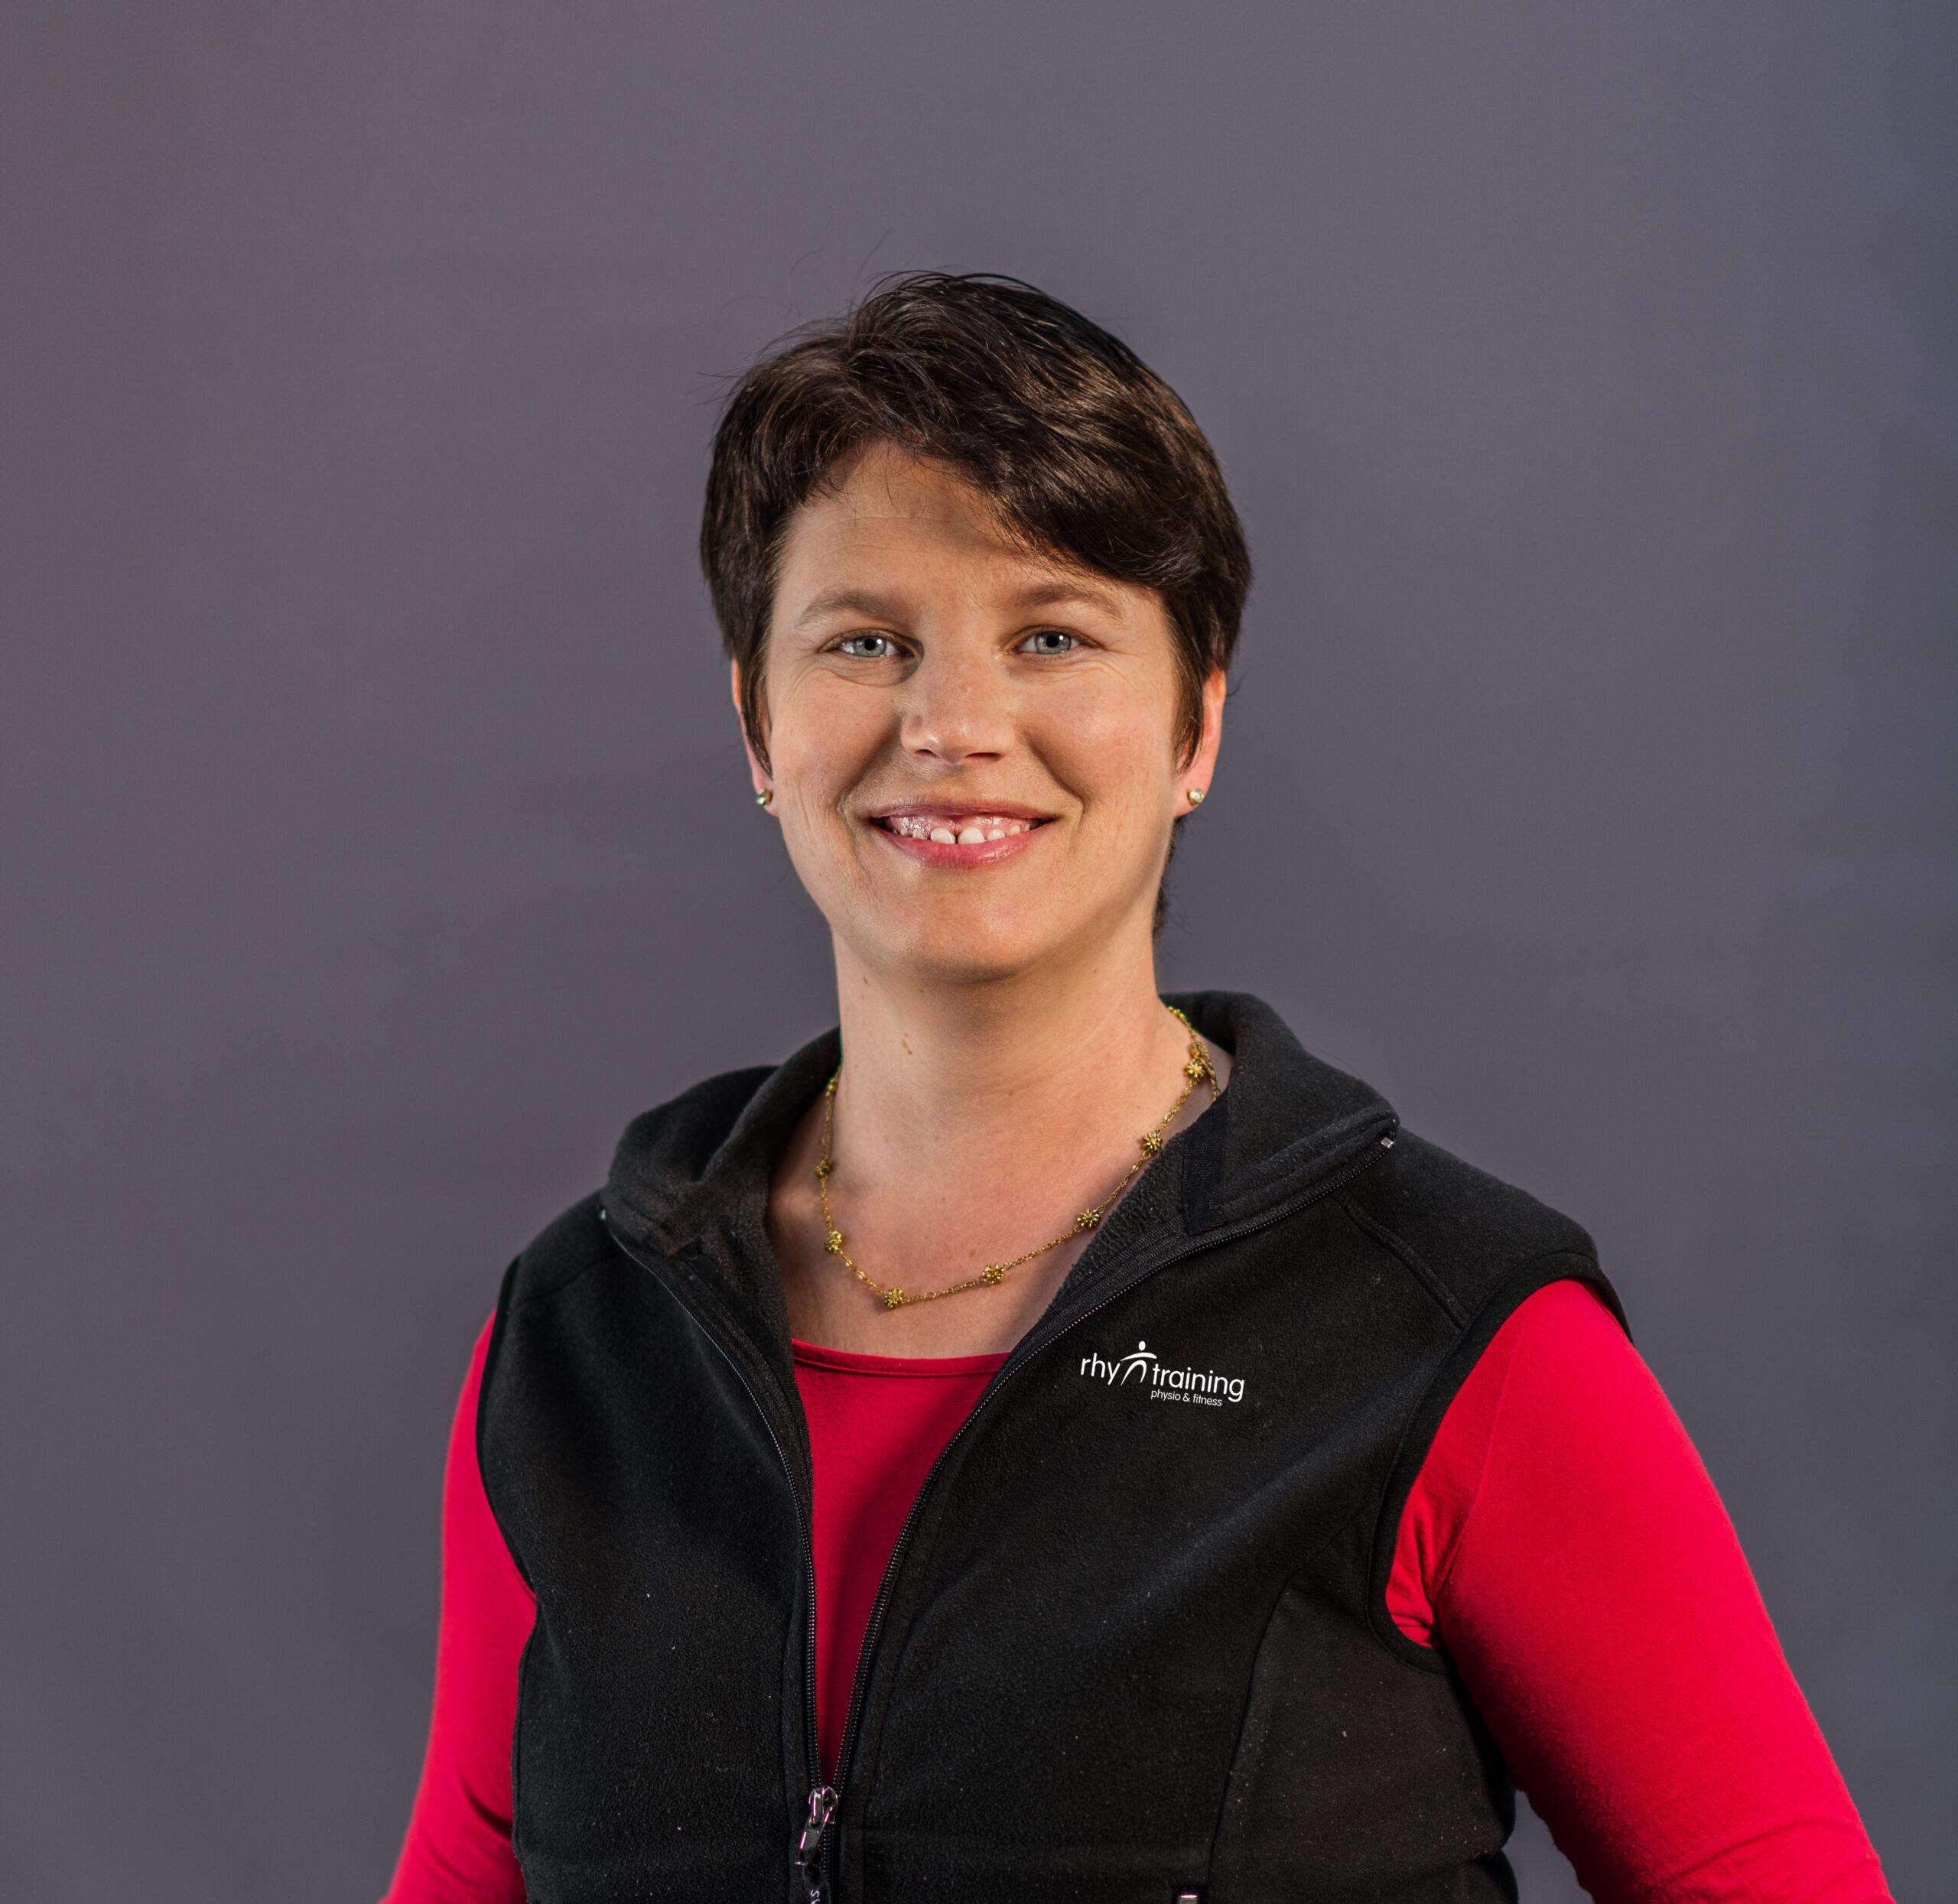 rhytraining - physio & fitness stein am rhein | Irene Schmid